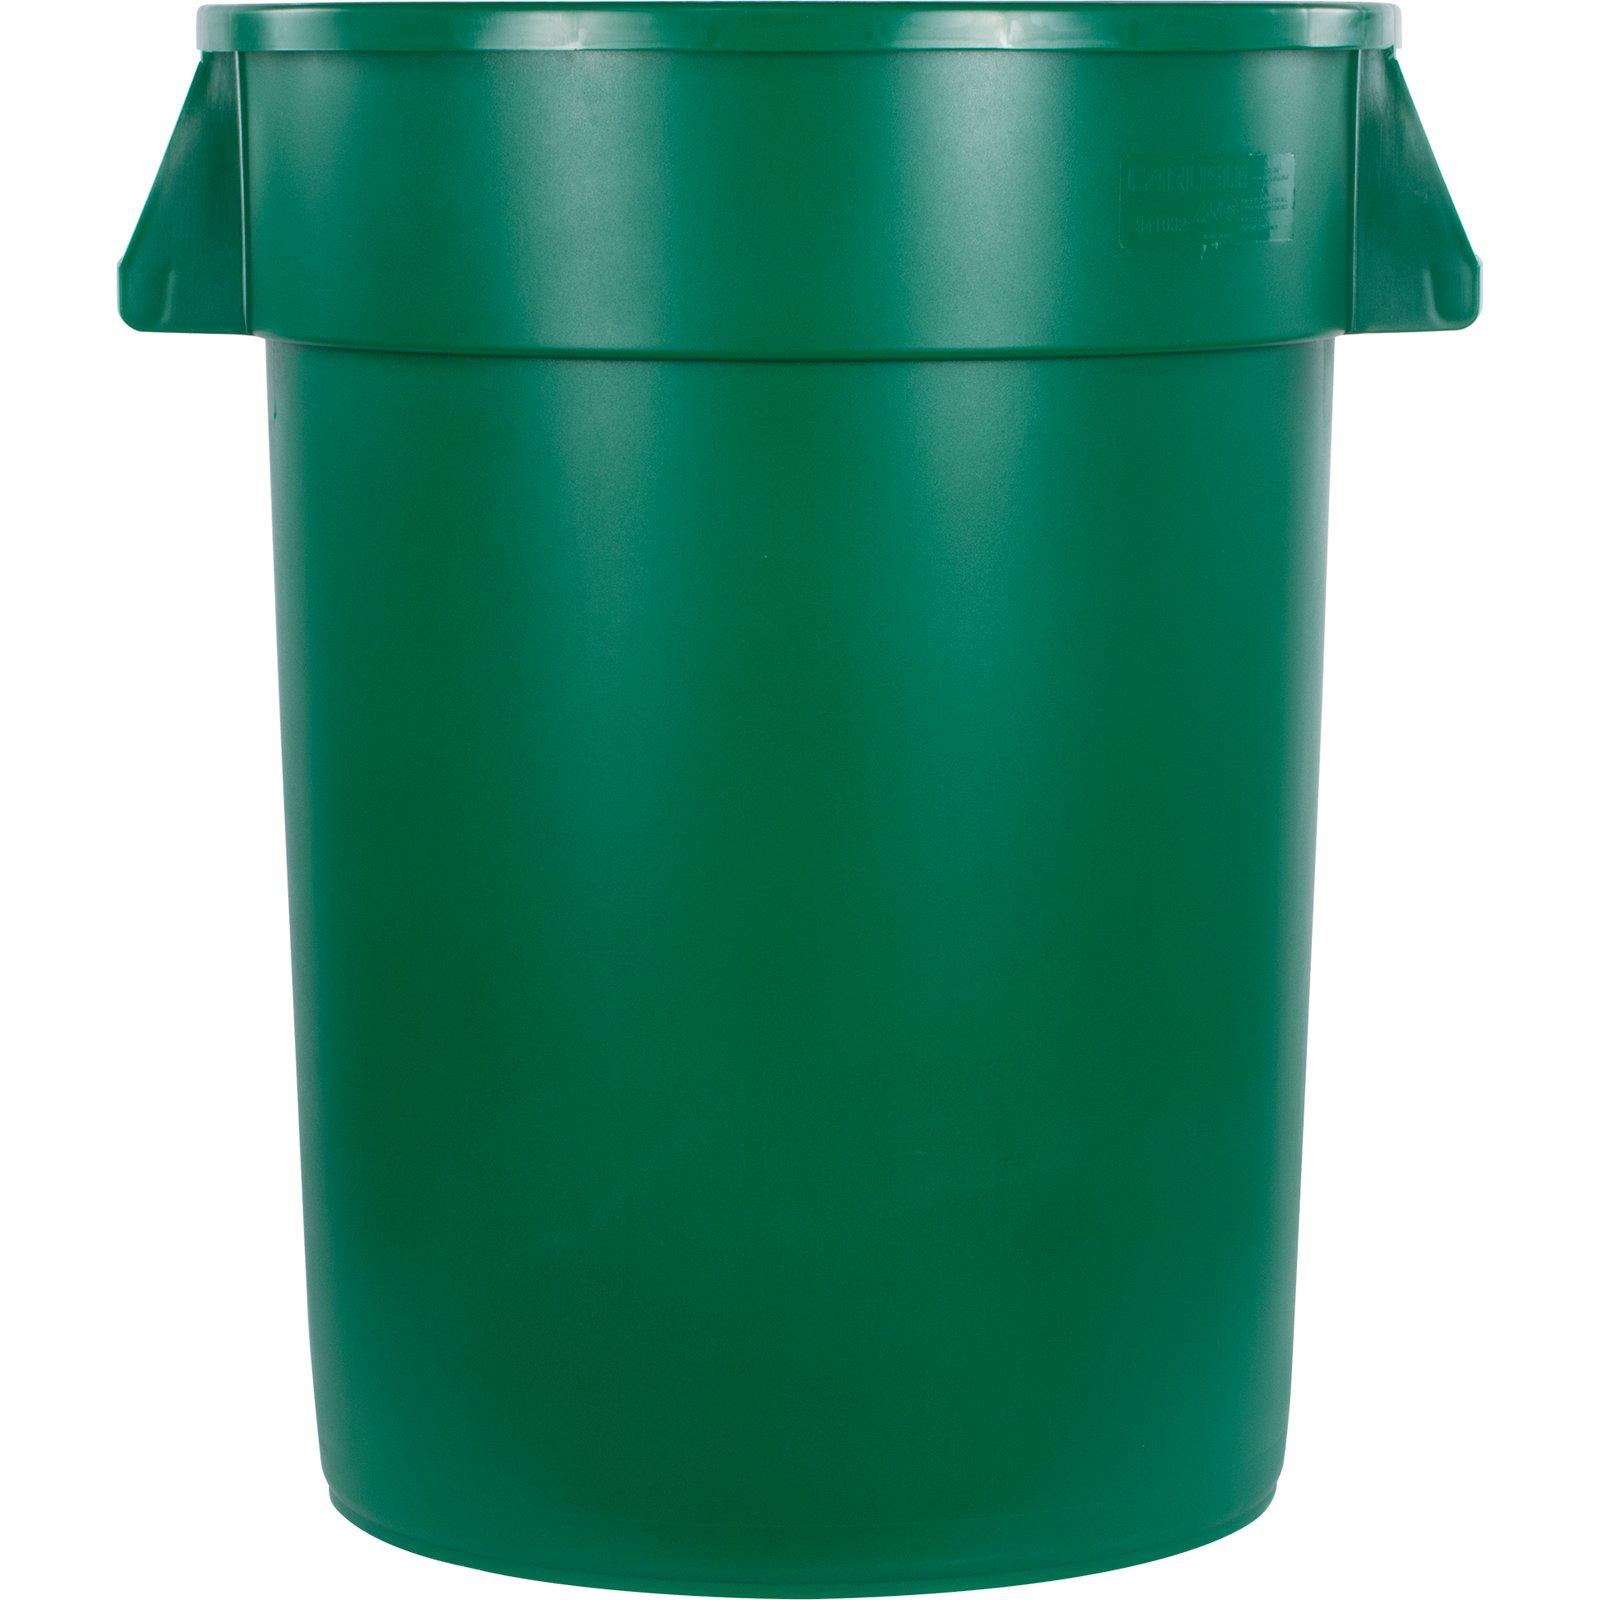 34103209 - Bronco™ Round Waste Bin Trash Container 32 Gallon - Green ...